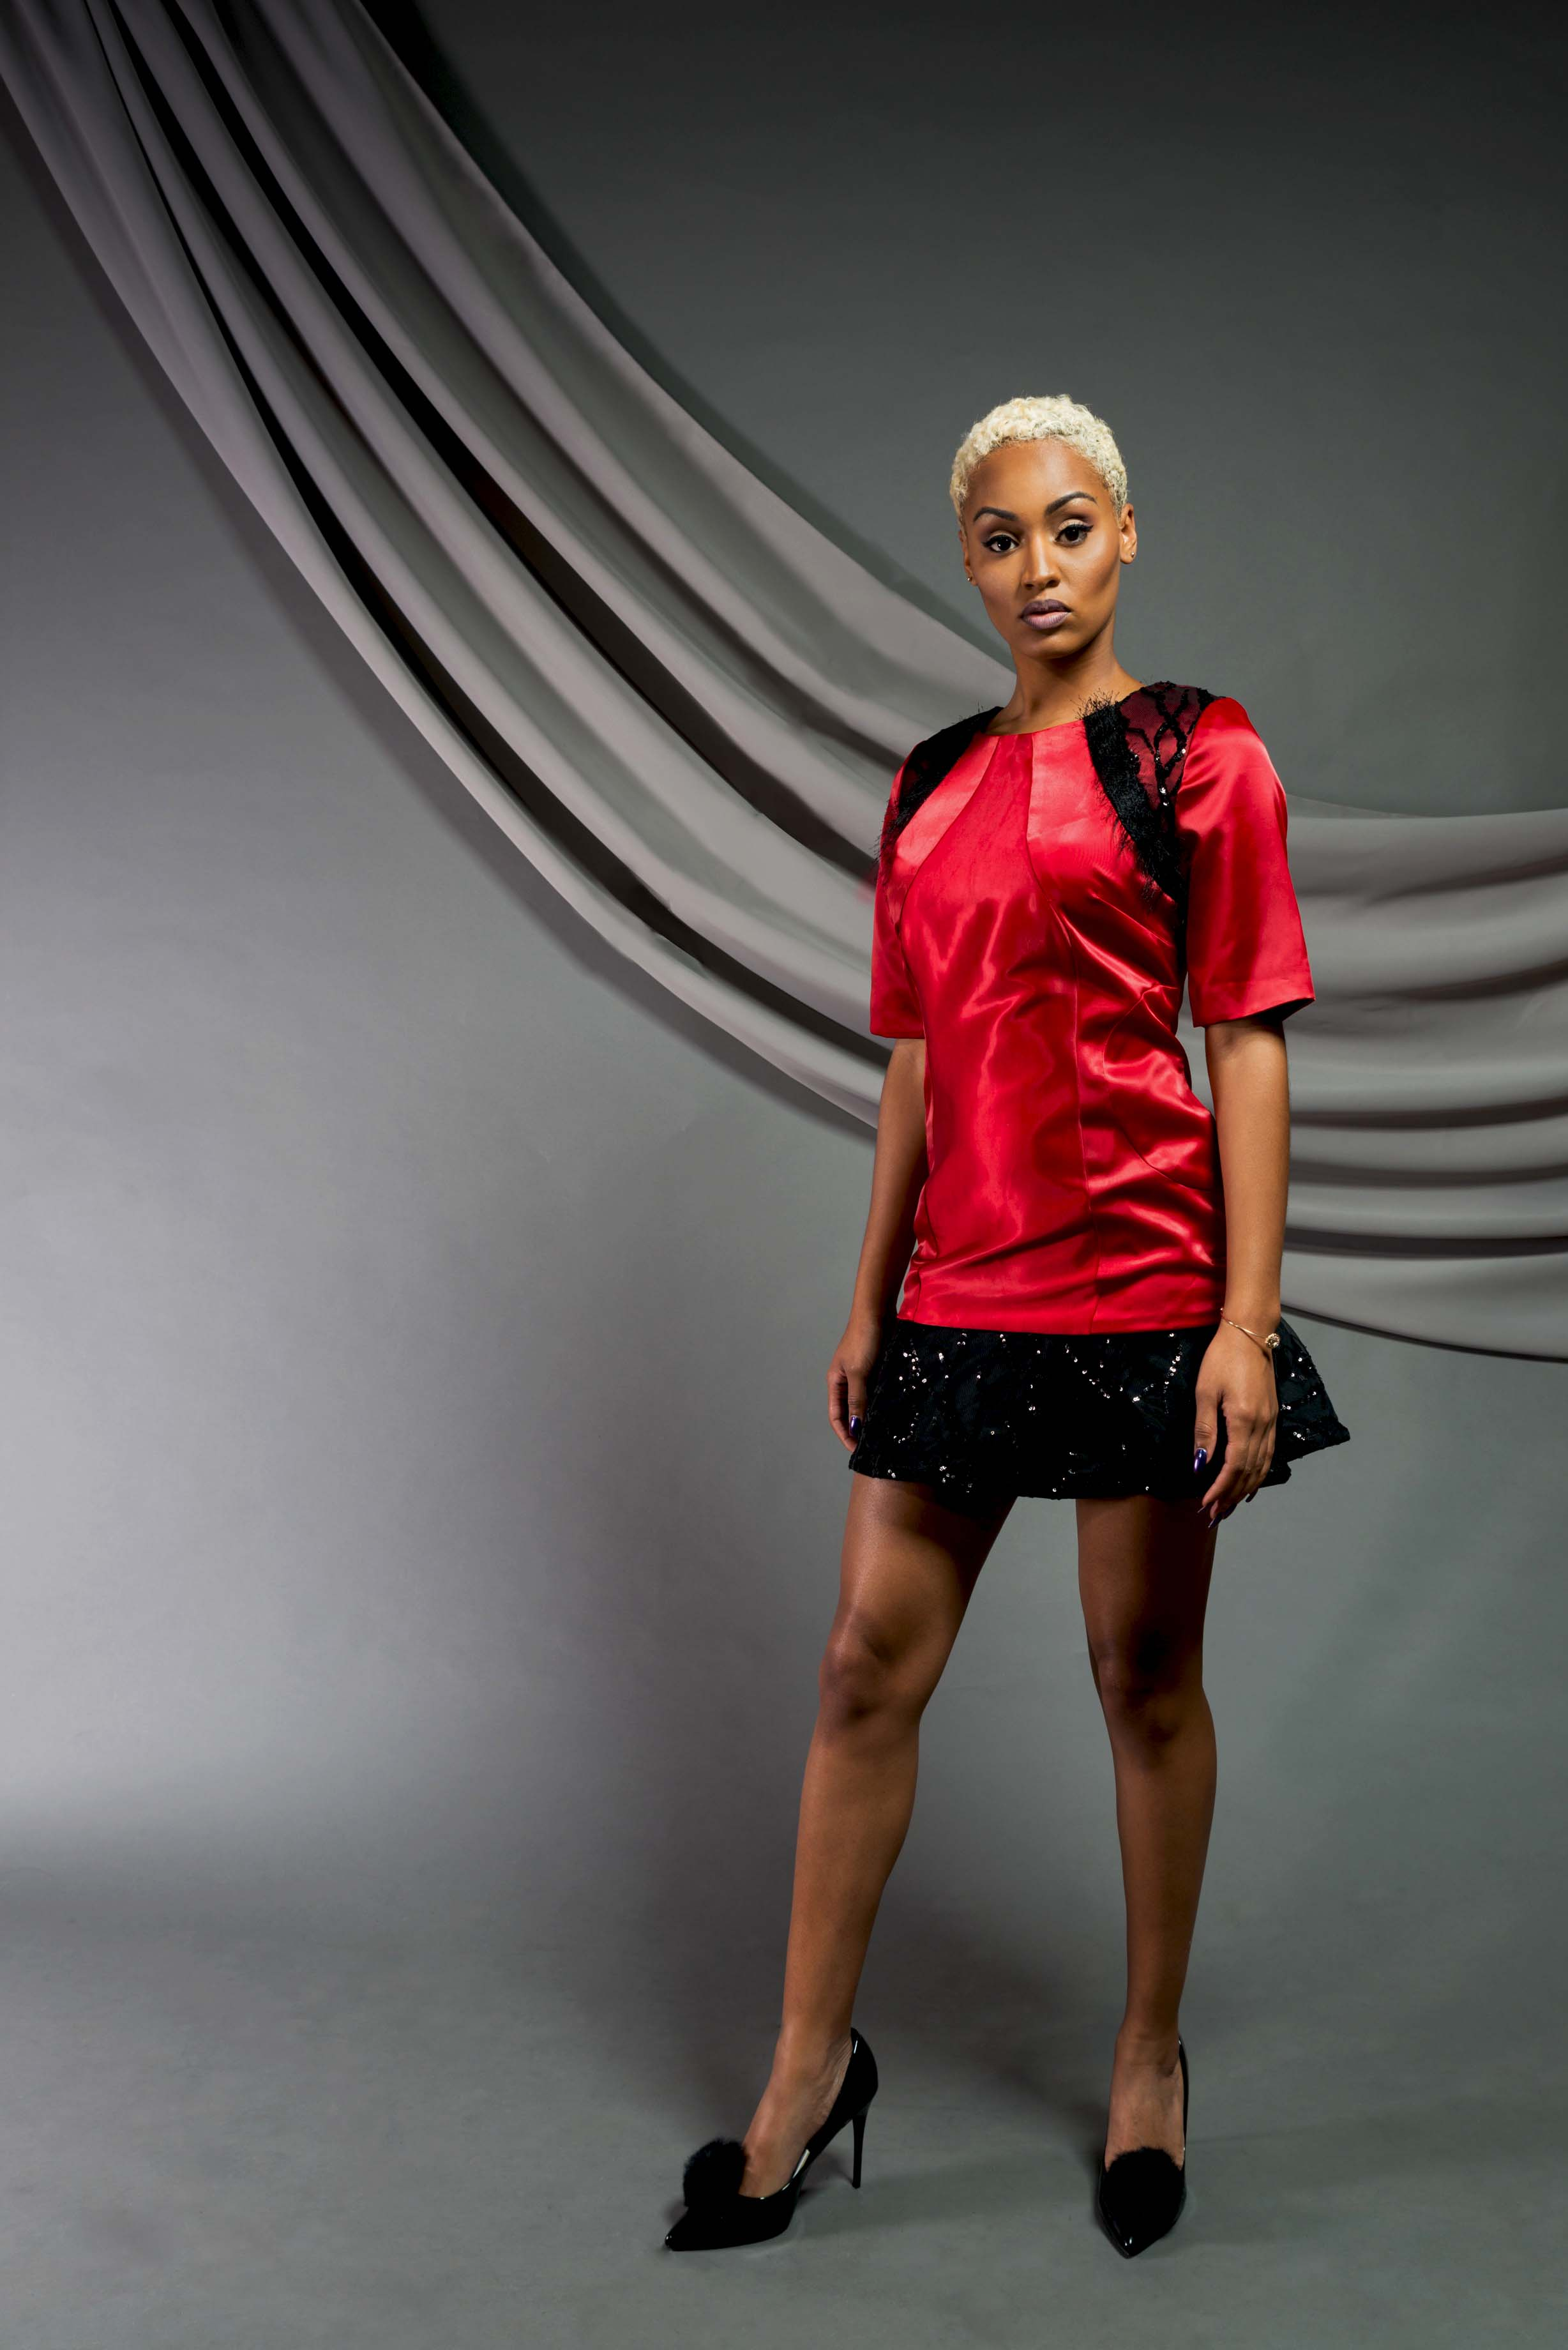 Red Embellished Cocktail Dress:  Satin charmeuse, Eyelash mesh knit, sequin mesh